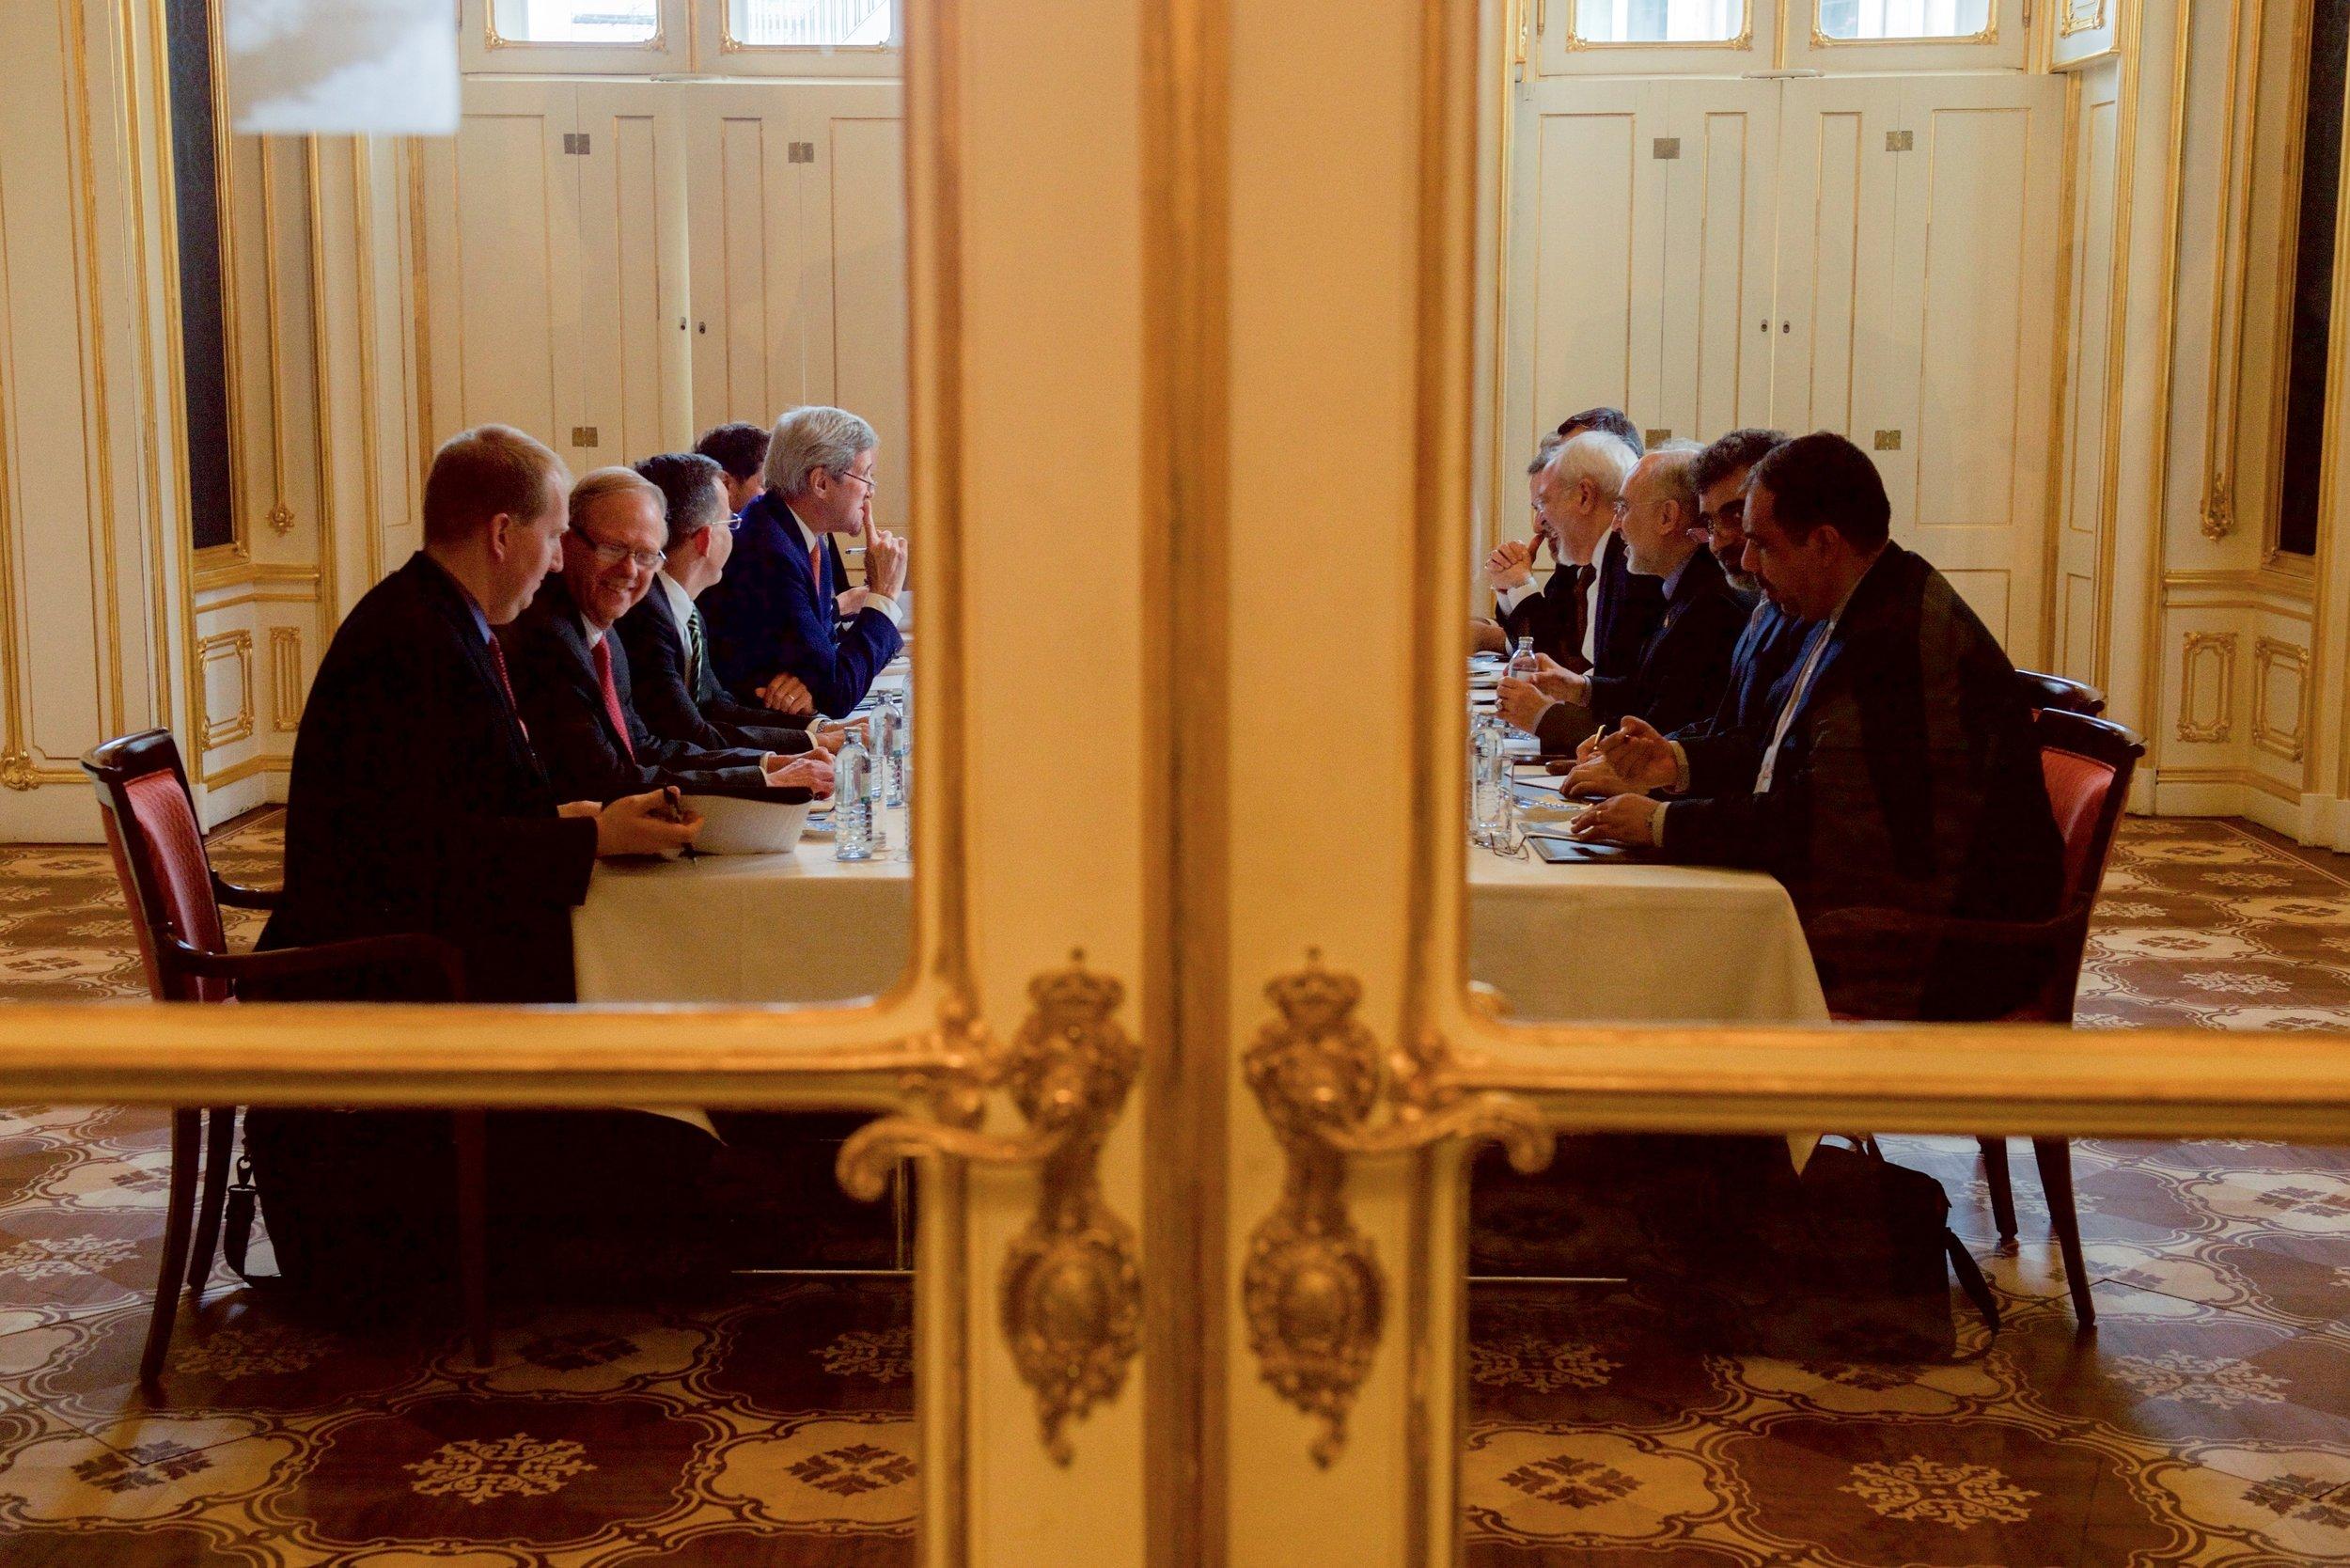 A group session during the Iran nuclear talk marathon in Vienna, Austria.